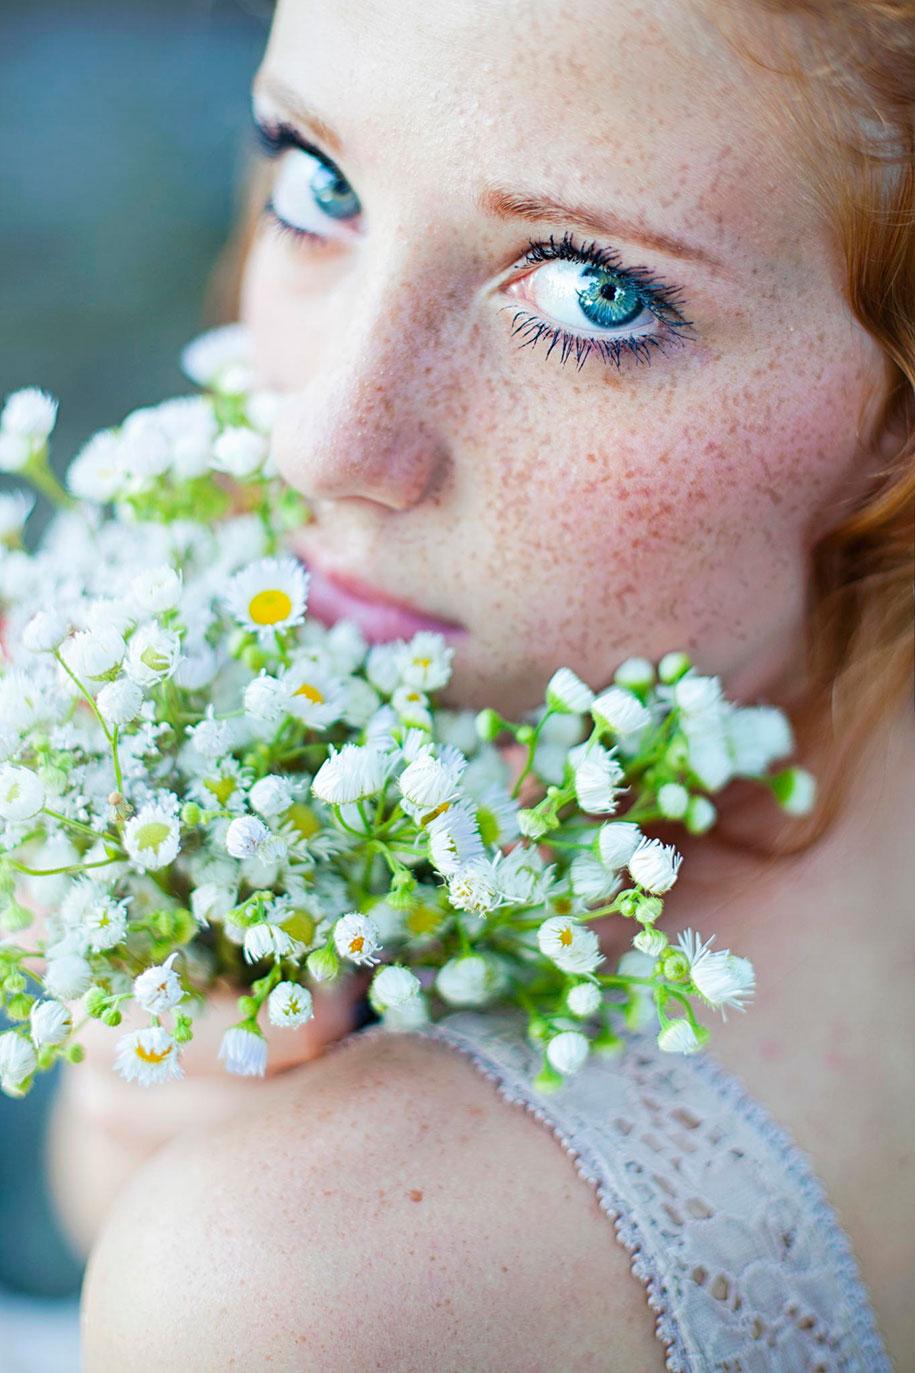 redhead-women-portraits-maja-topcagic-bosnia-herzegovina-3